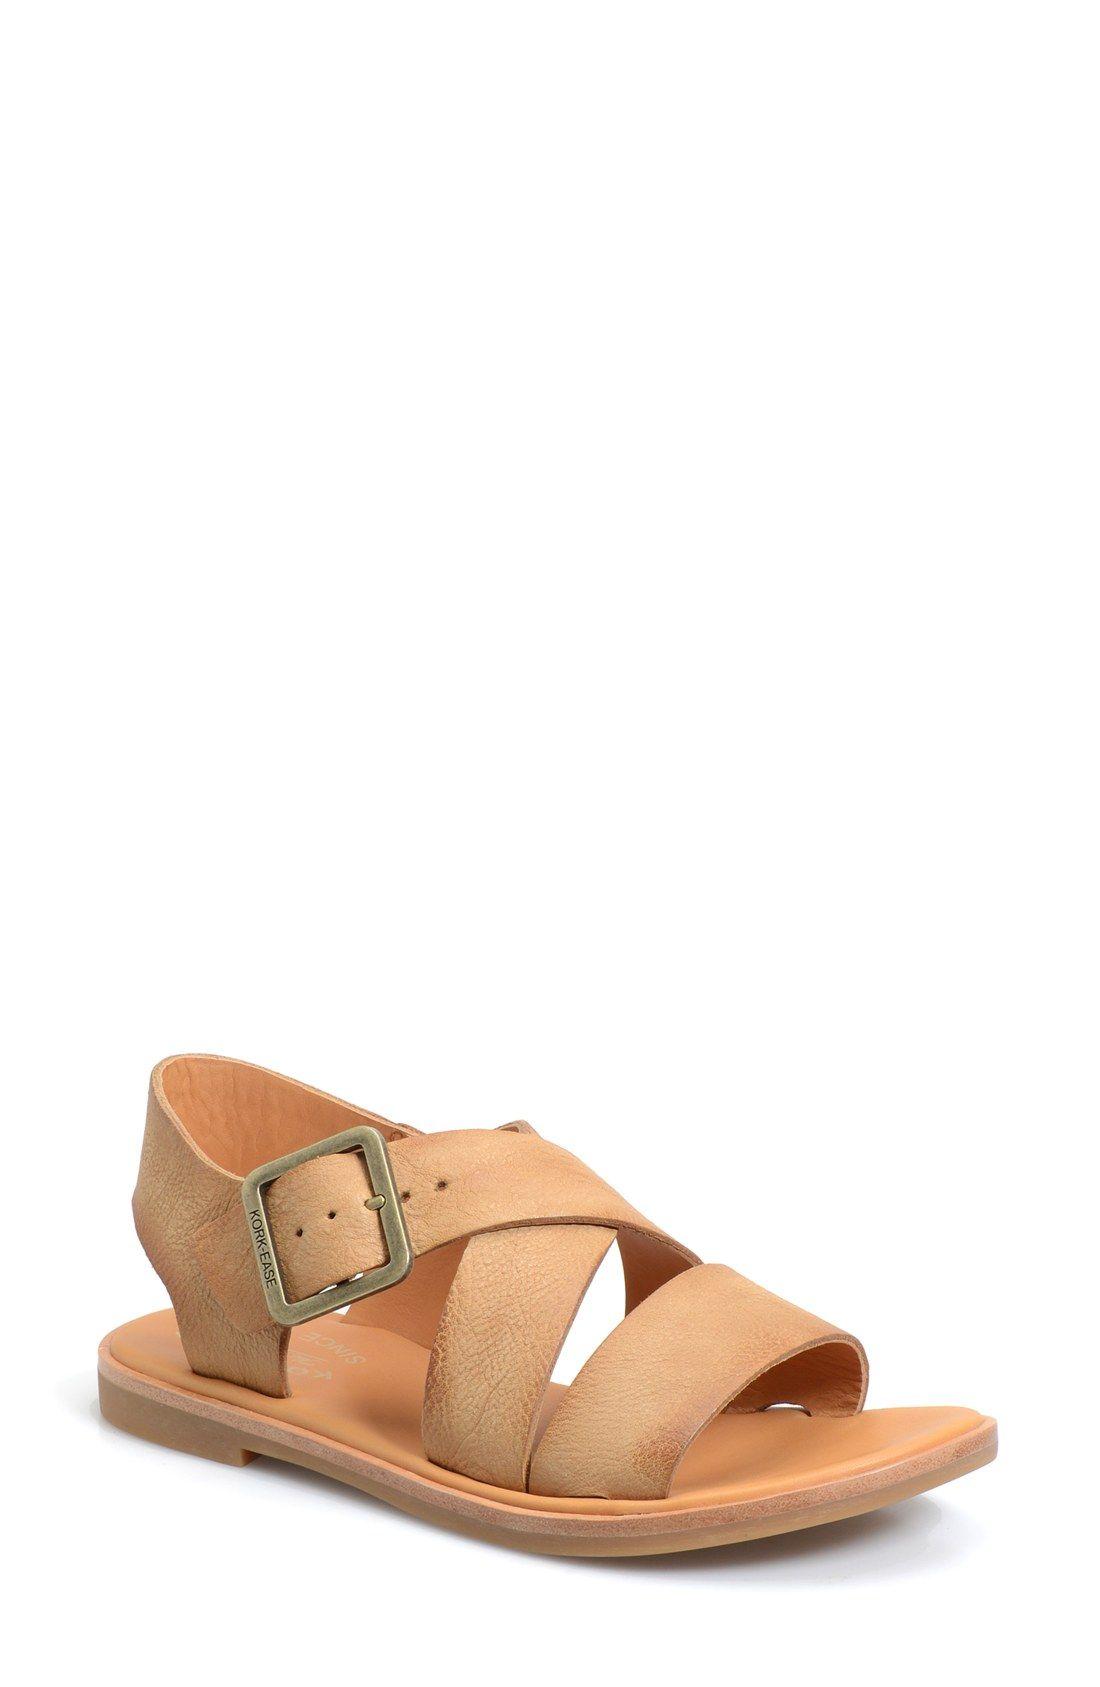 Kork-Ease® 'Nara' Flat Sandal $124.95 ❤️